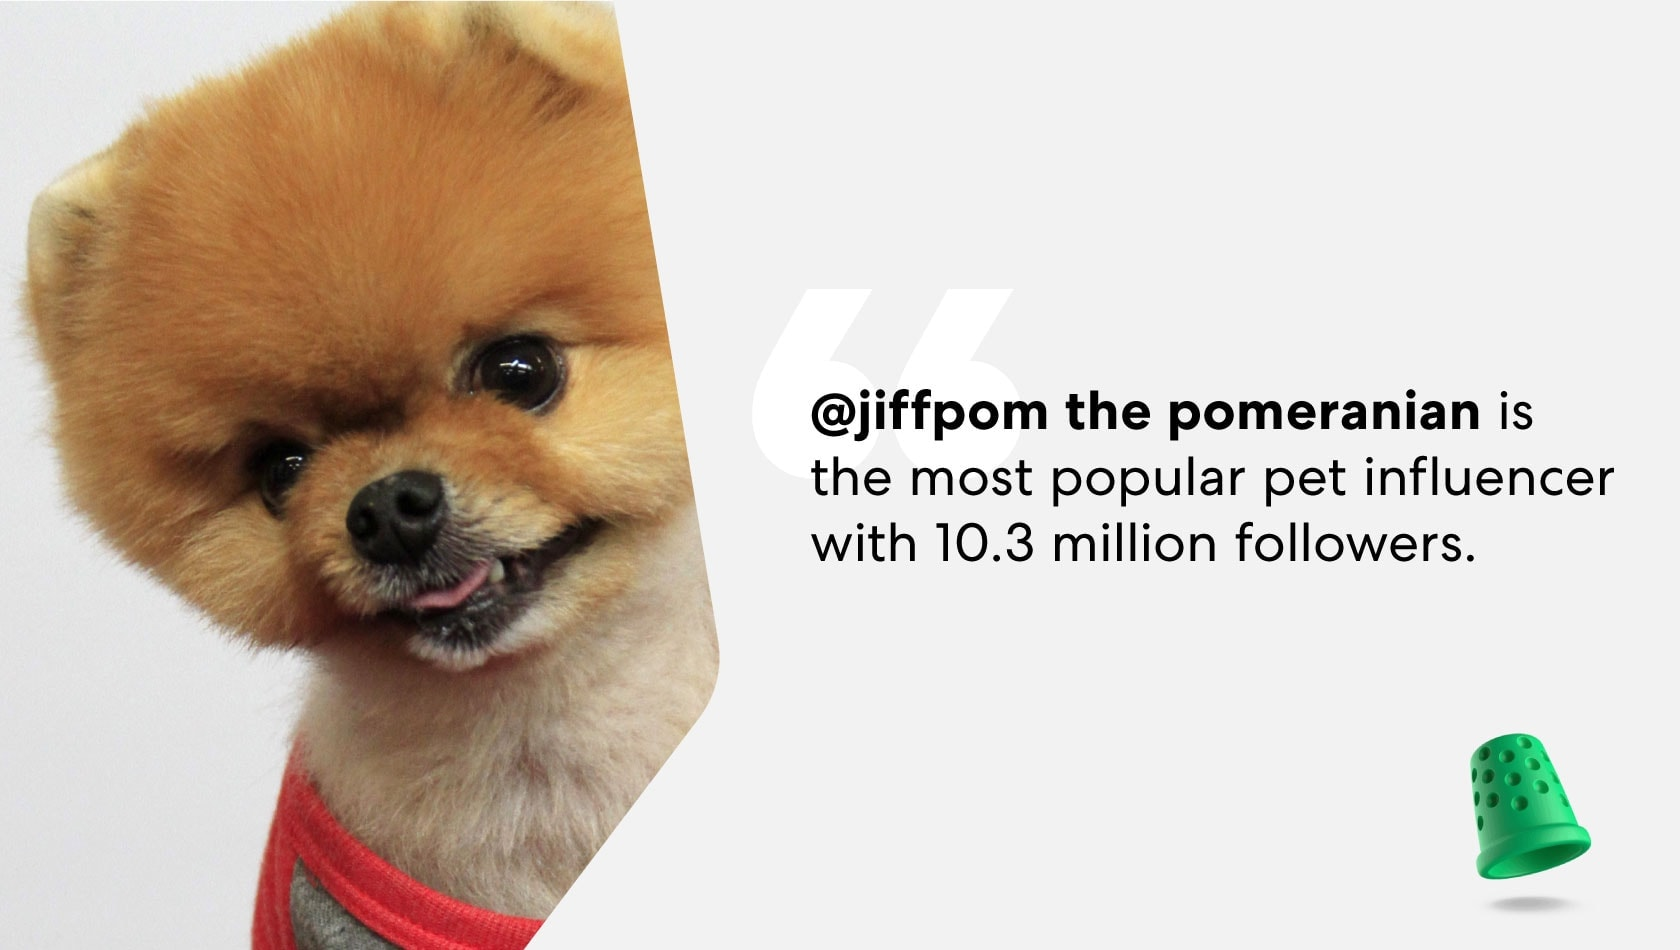 jiffpom-most-popular-pet-influencer